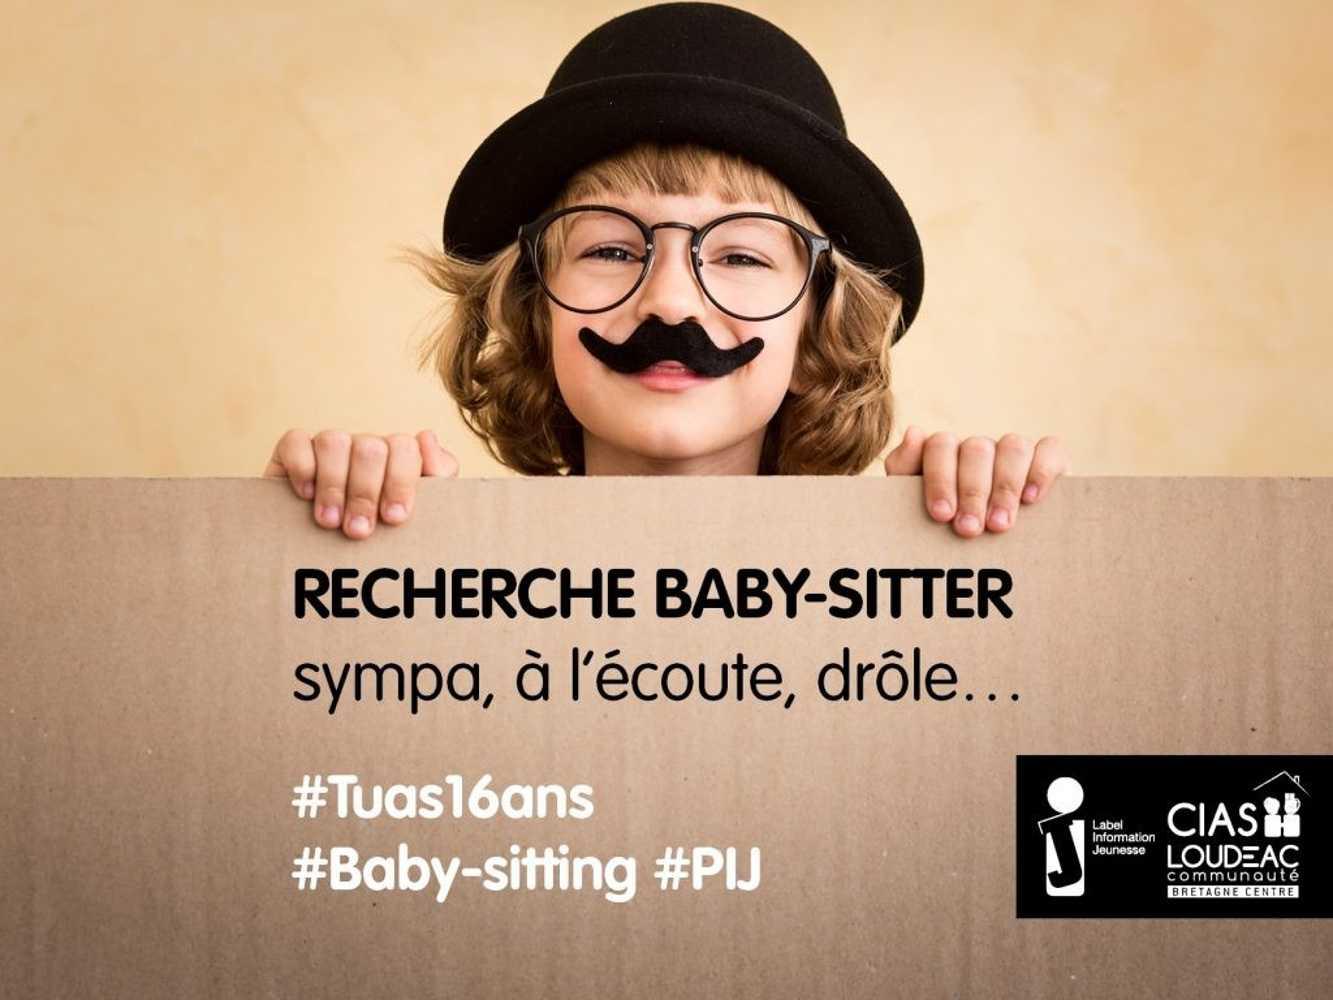 CIAS DE LOUDÉAC : opération baby-sitting 0